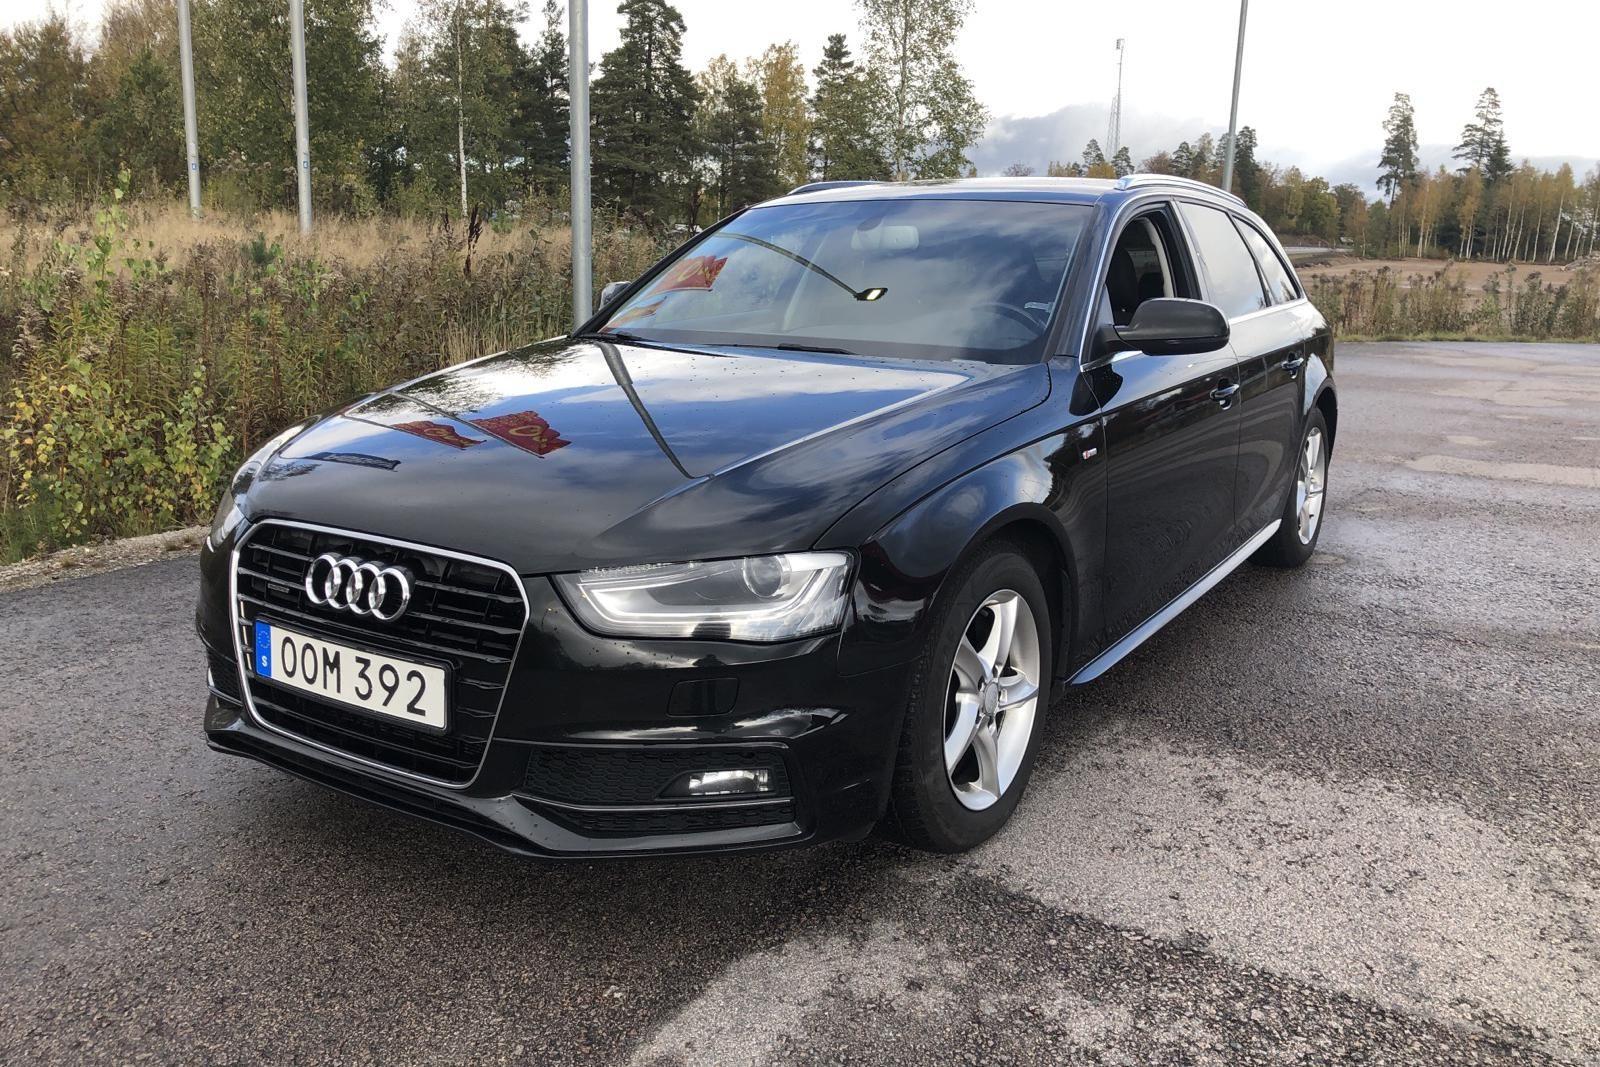 Audi A4 2.0 TDI sauberer Diesel Avant quattro (190hk)